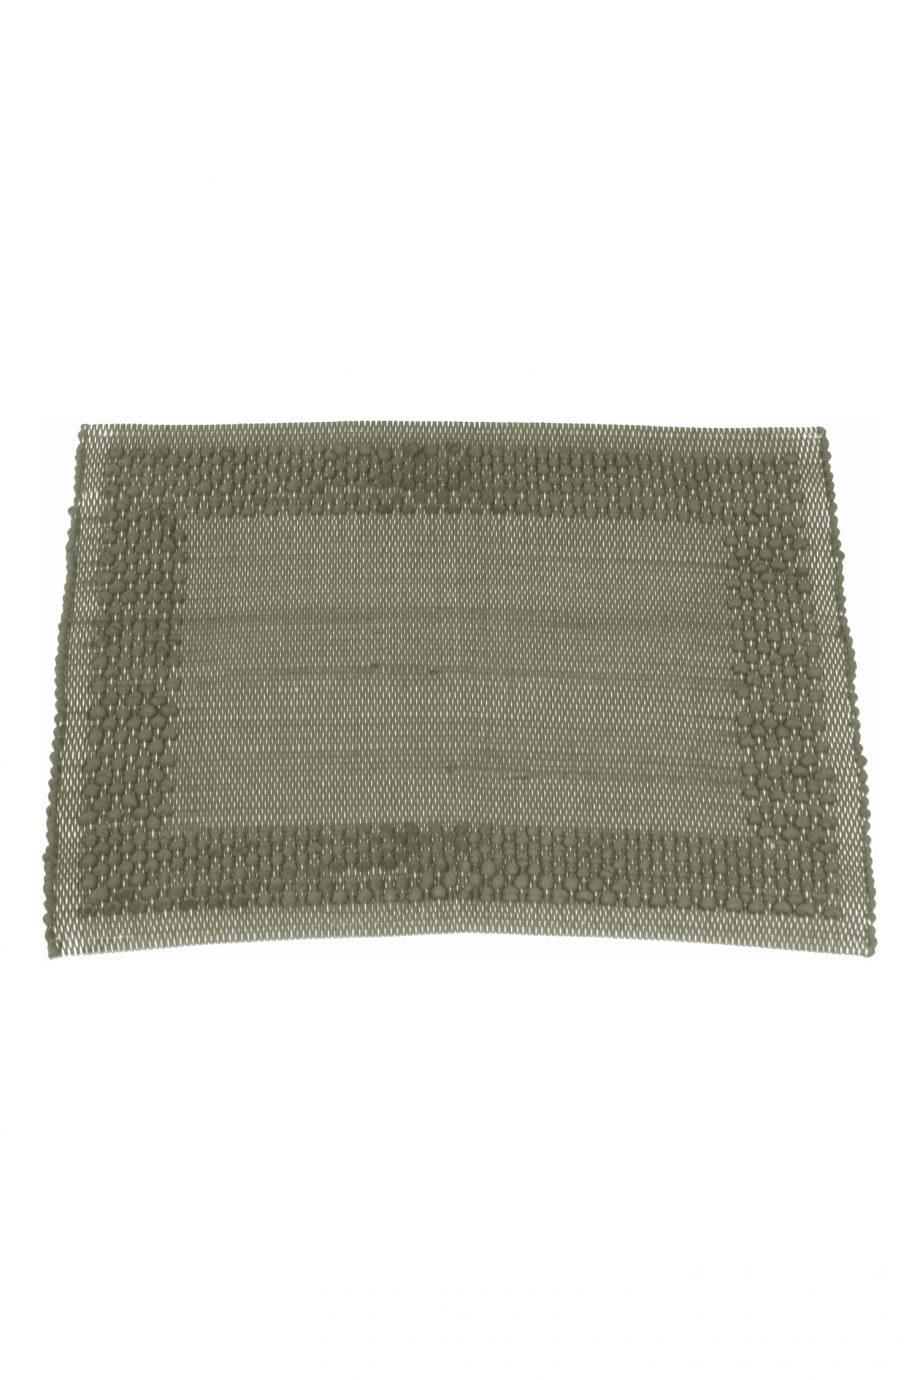 frame olijf groen geweven katoenen placemat small